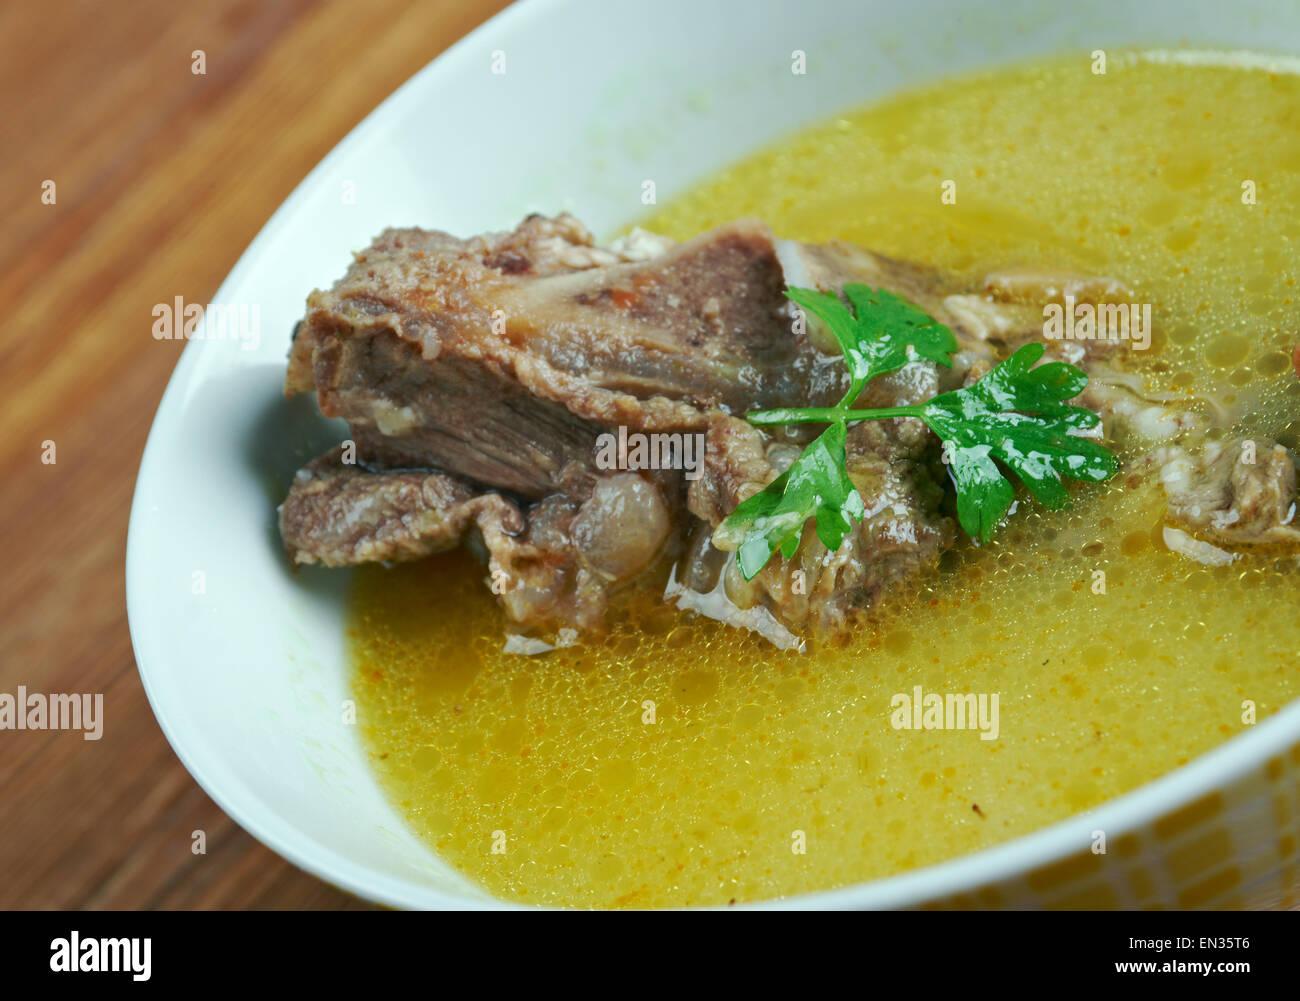 kelle-paca - liquid hot dish, soup, common in Azerbaijan, Iran and Turkey. - Stock Image